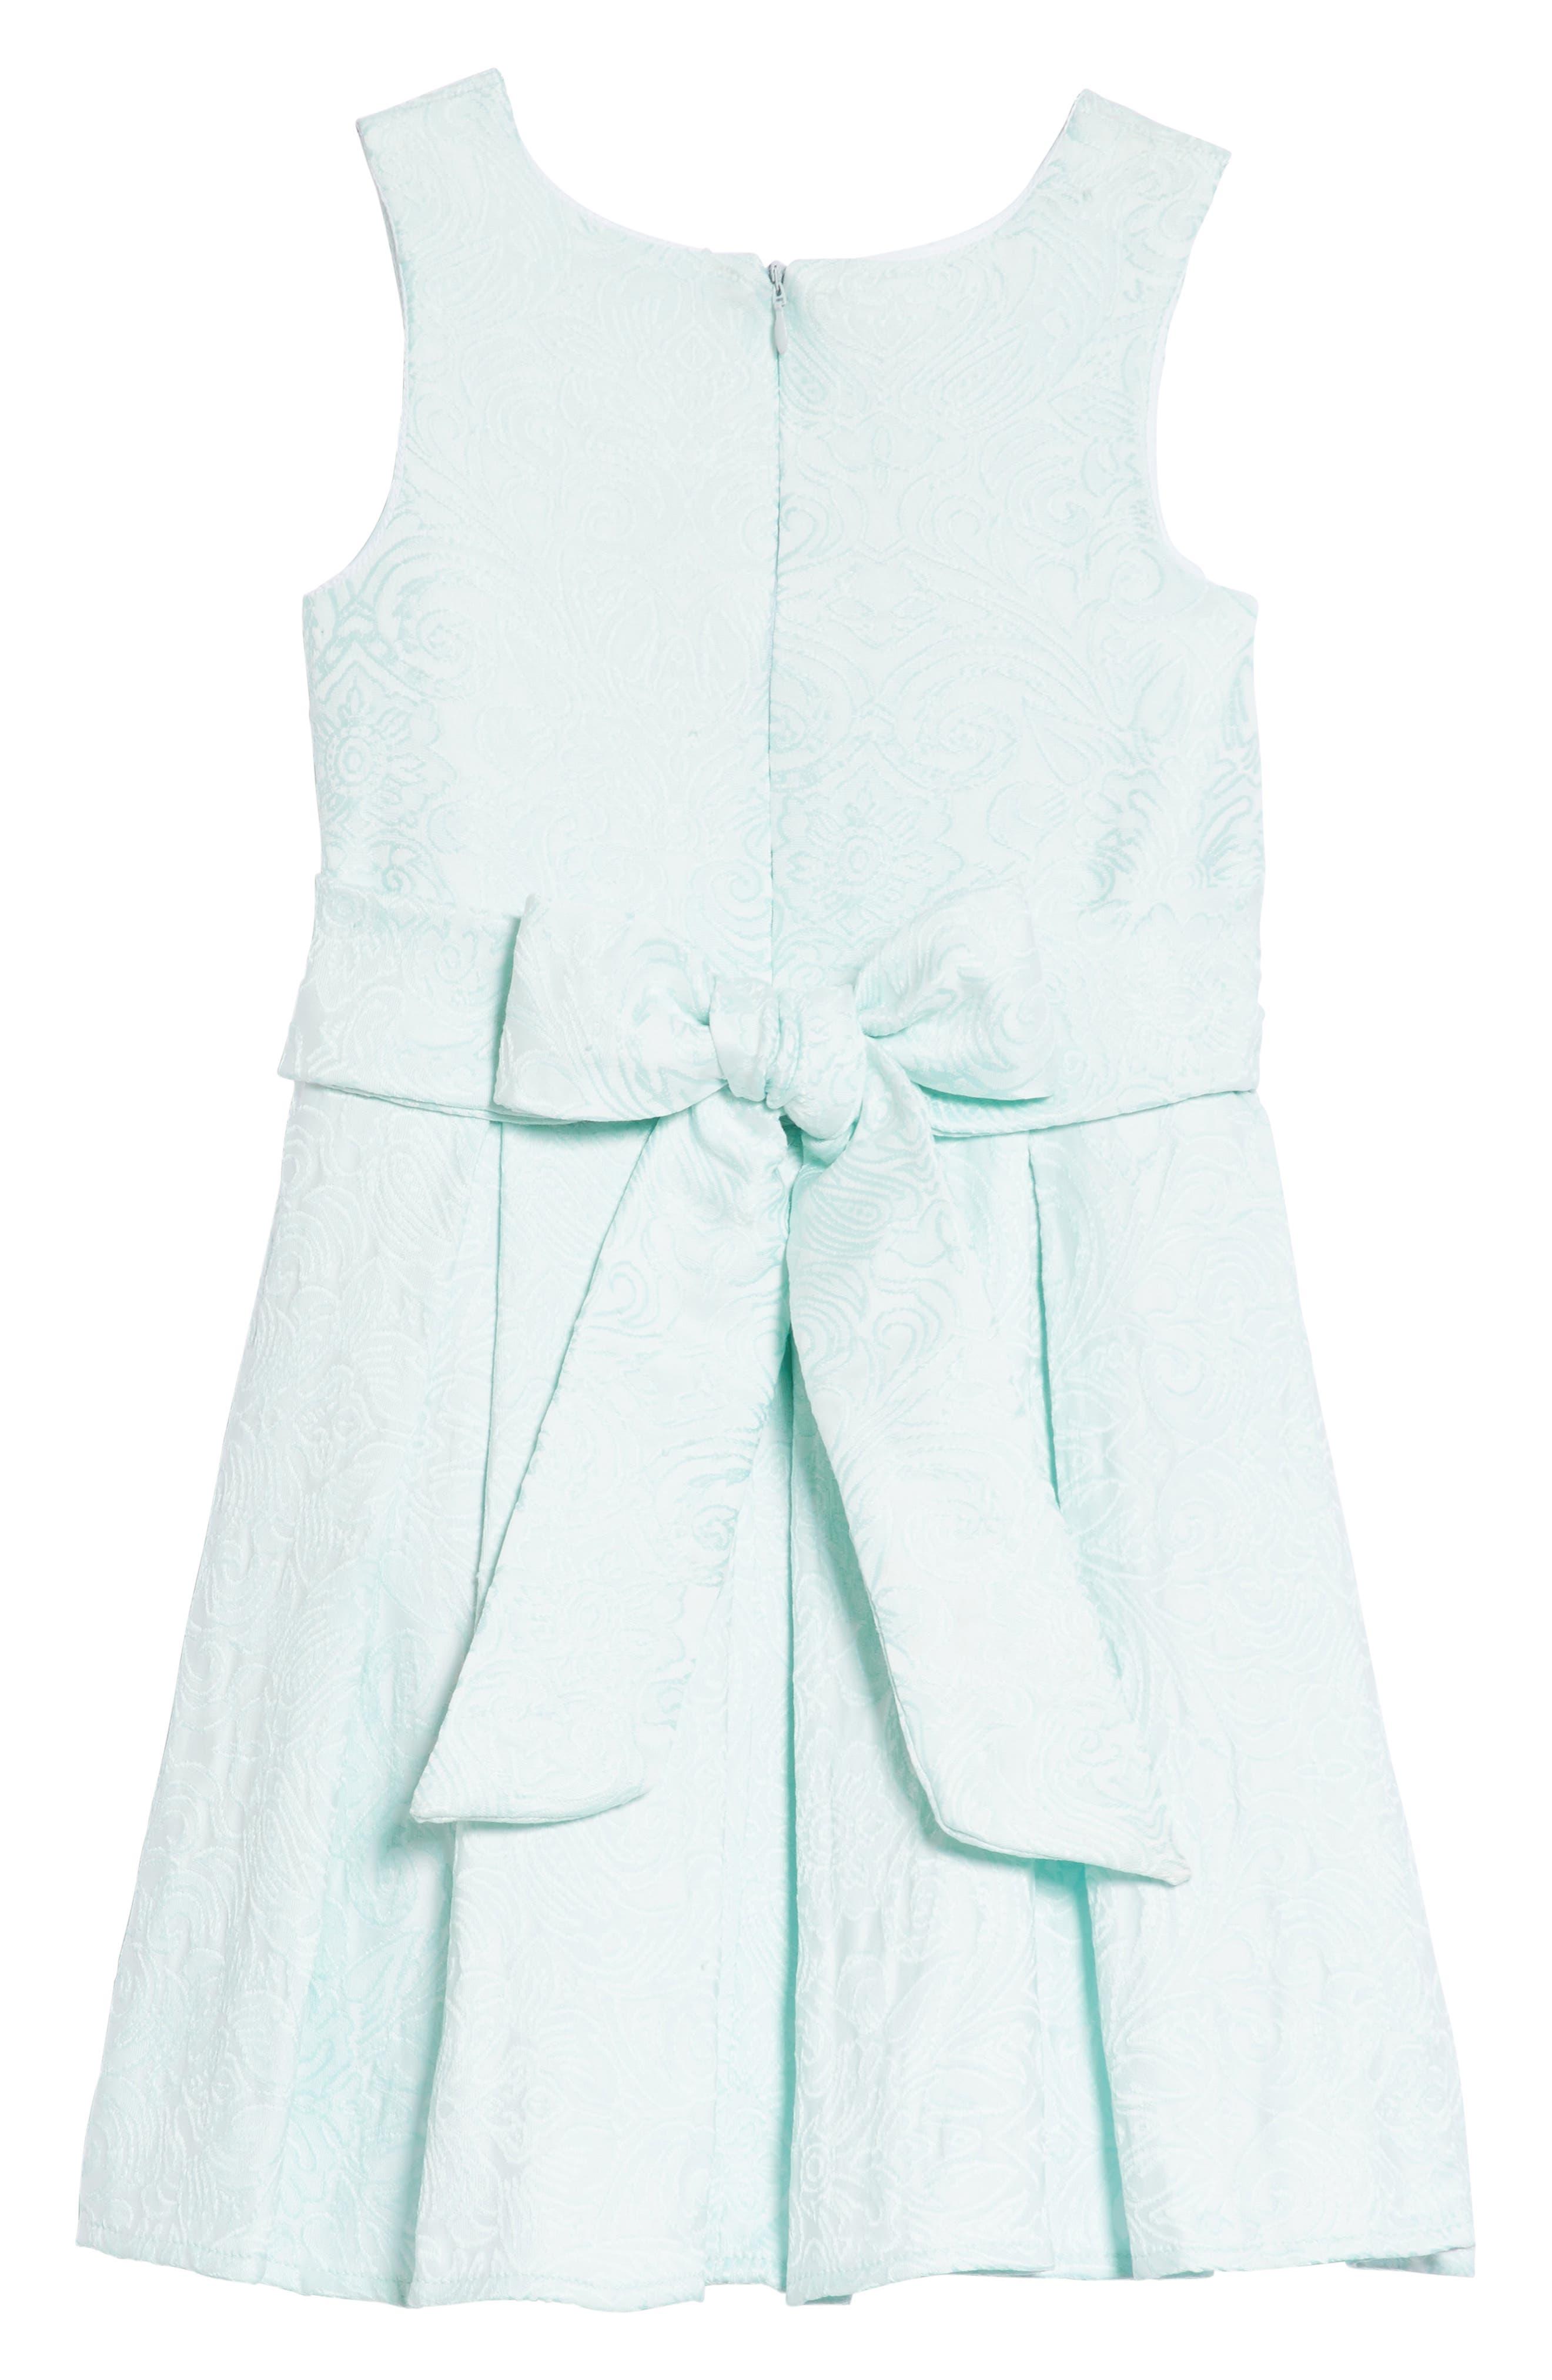 Megan Jacquard Dress,                             Alternate thumbnail 2, color,                             Aqua